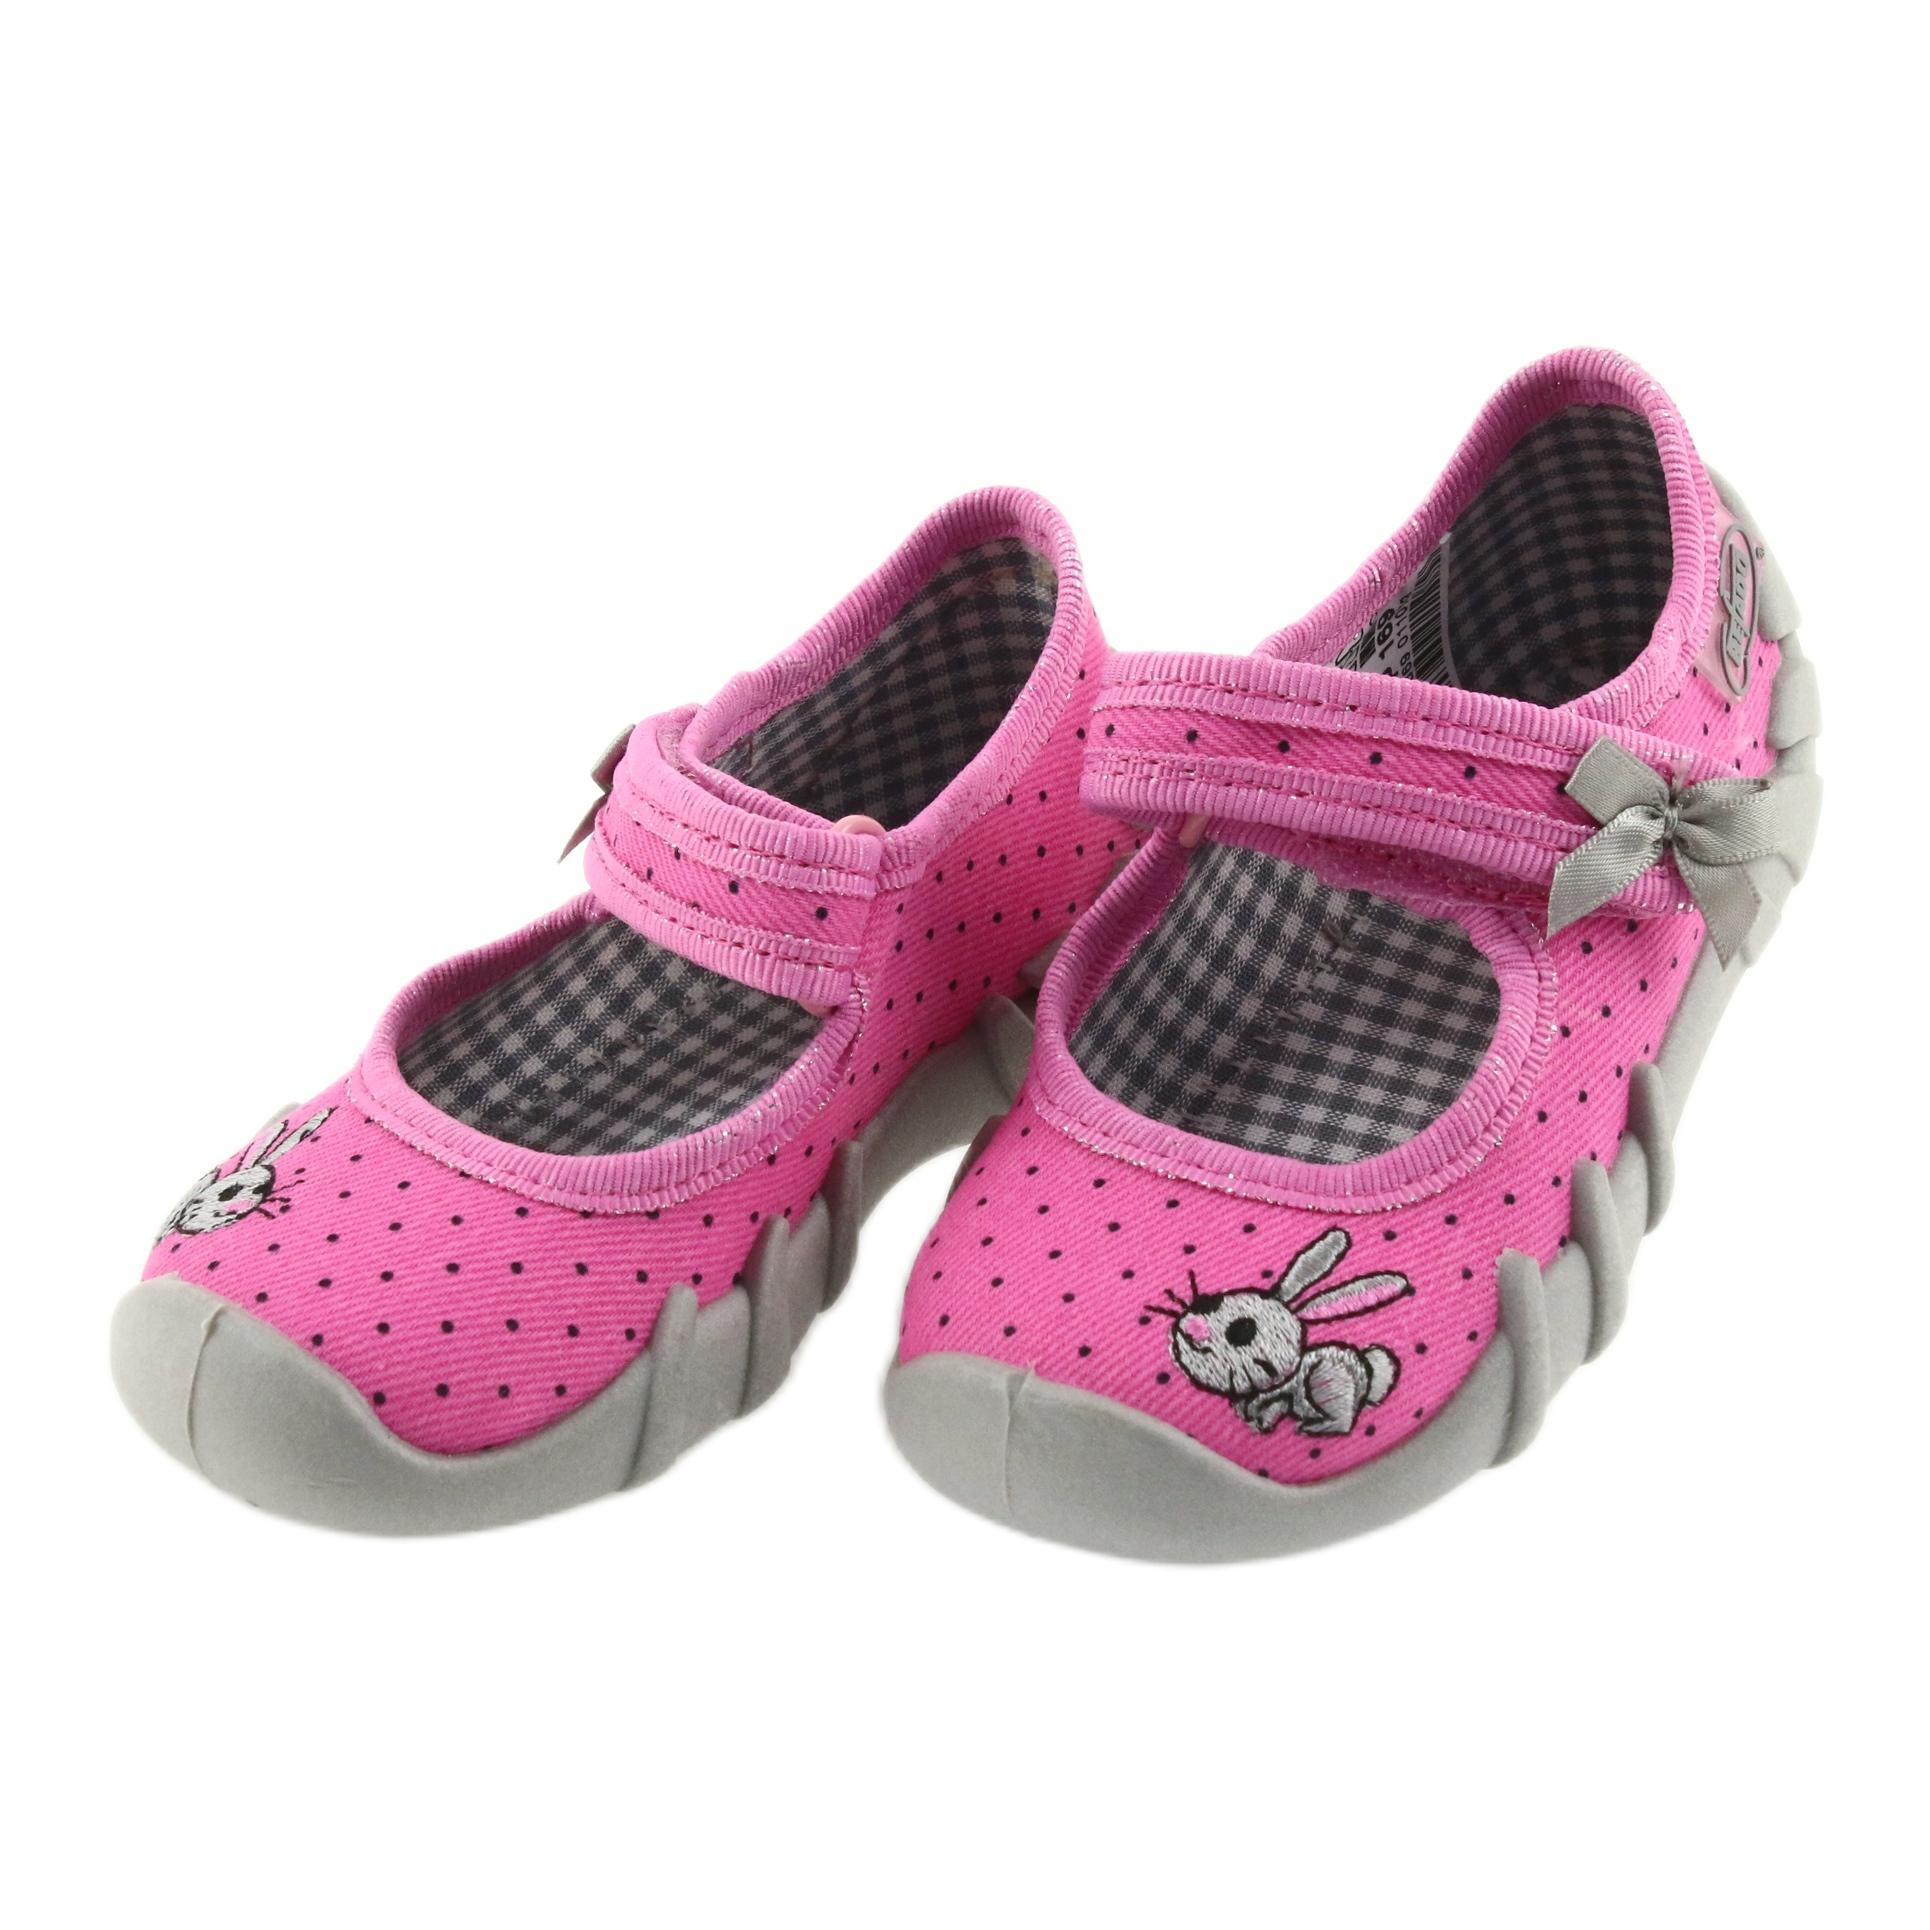 miniatura 3 - Pantofole da ballerina Befado per bambini 109P169 nero grigio rosa